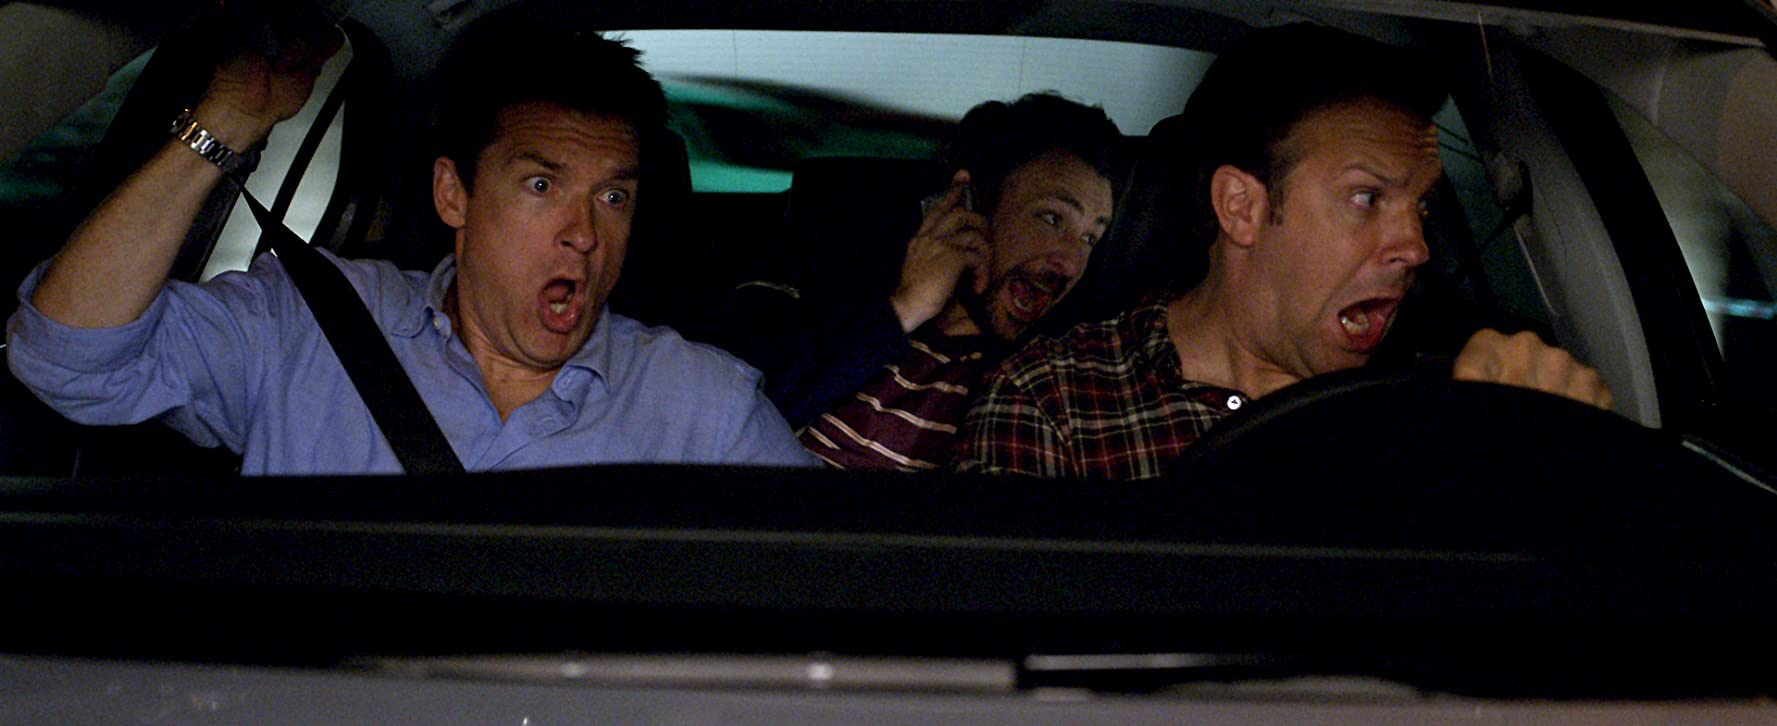 Jason Bateman, Charlie Day, and Jason Sudeikis in Horrible Bosses (2011)